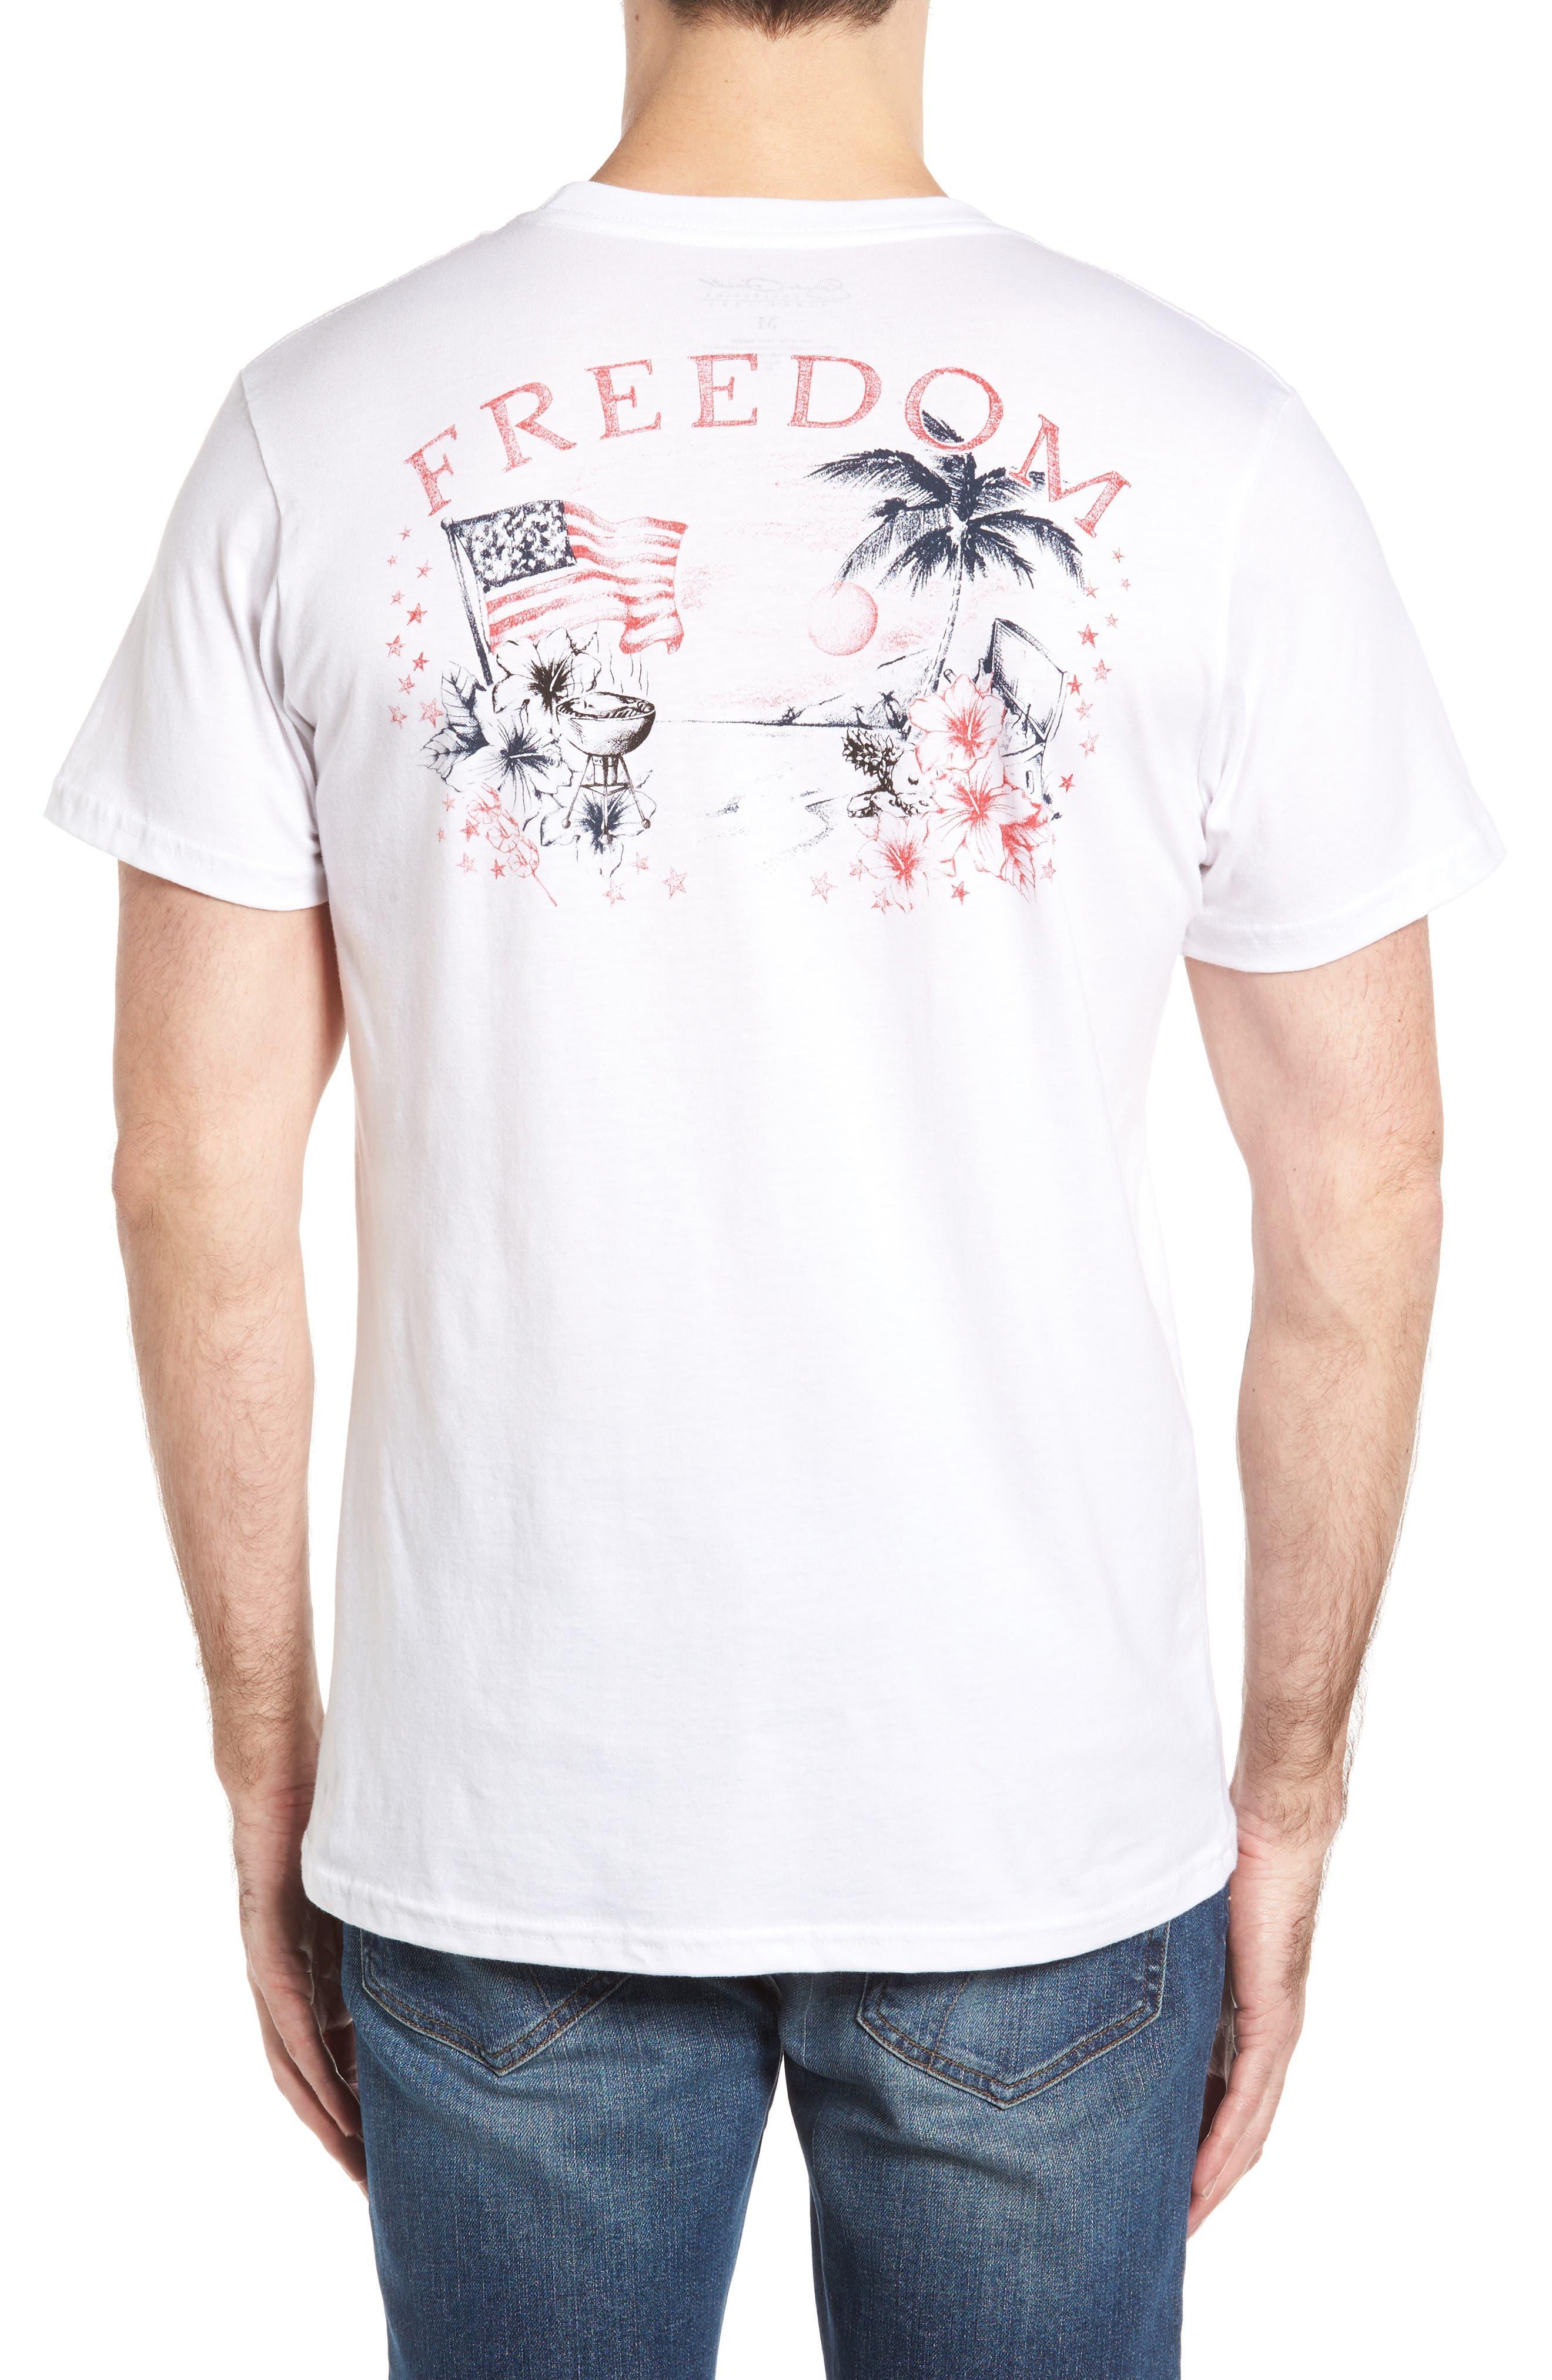 Freedom T-Shirt,                             Alternate thumbnail 2, color,                             100